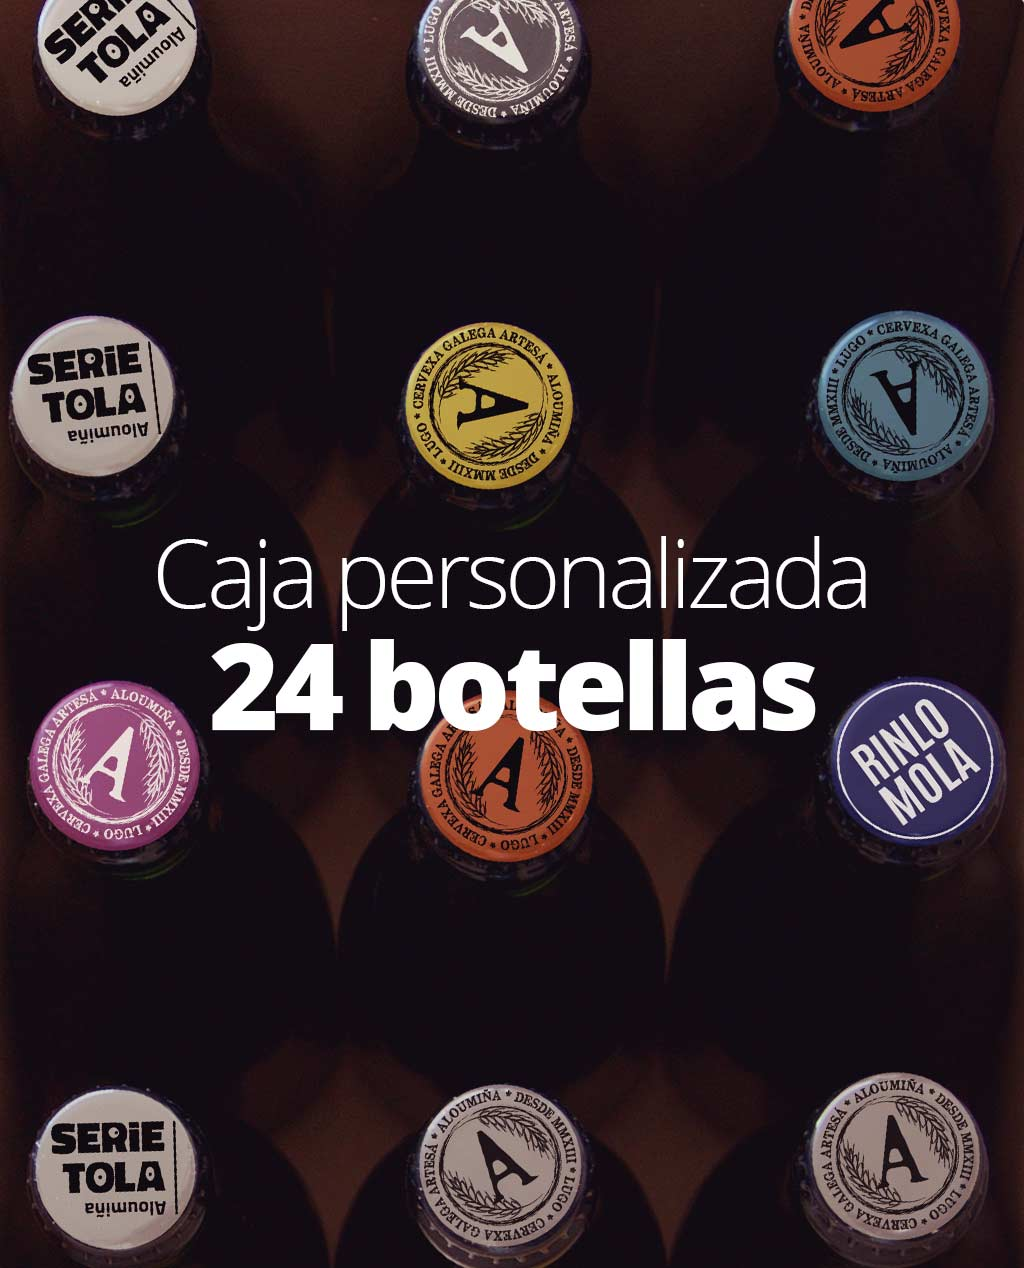 aloumina-cerveza-artesana-craft-beer-lugo-galicia-serietola-caja-personalizada-24-botellas-1024